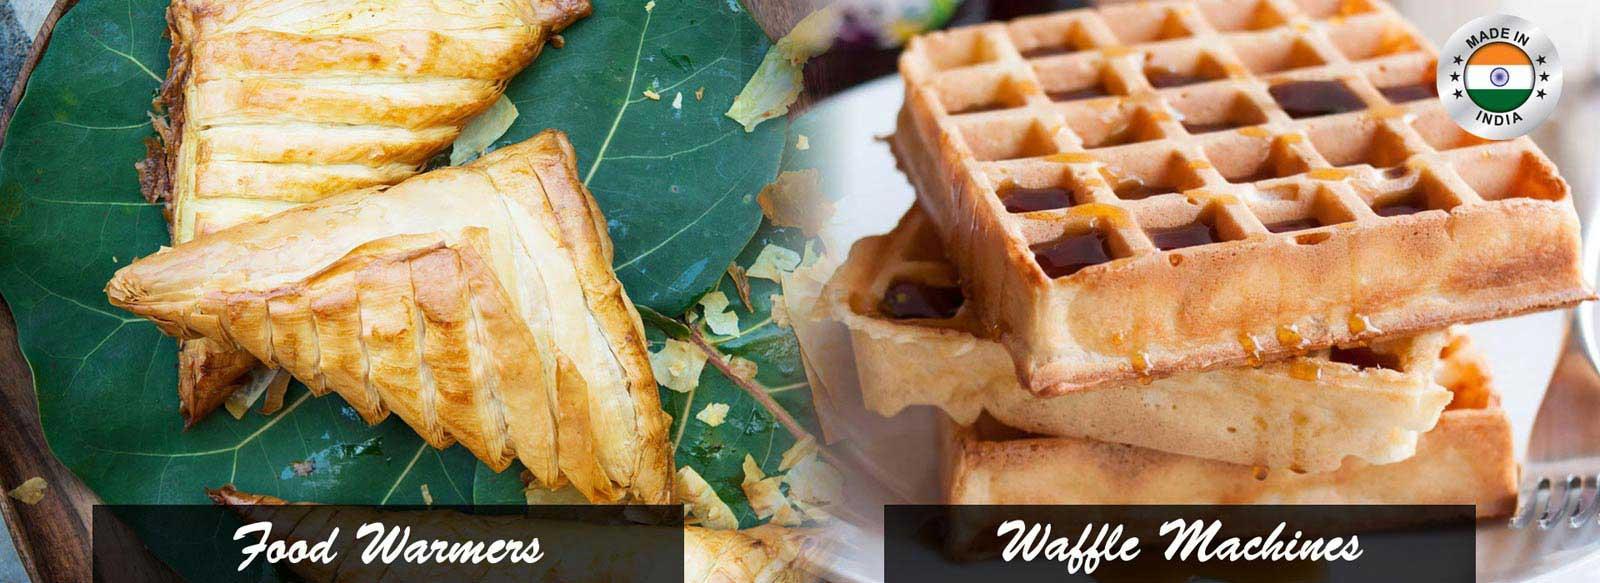 Food Warmers and Waffle Machines